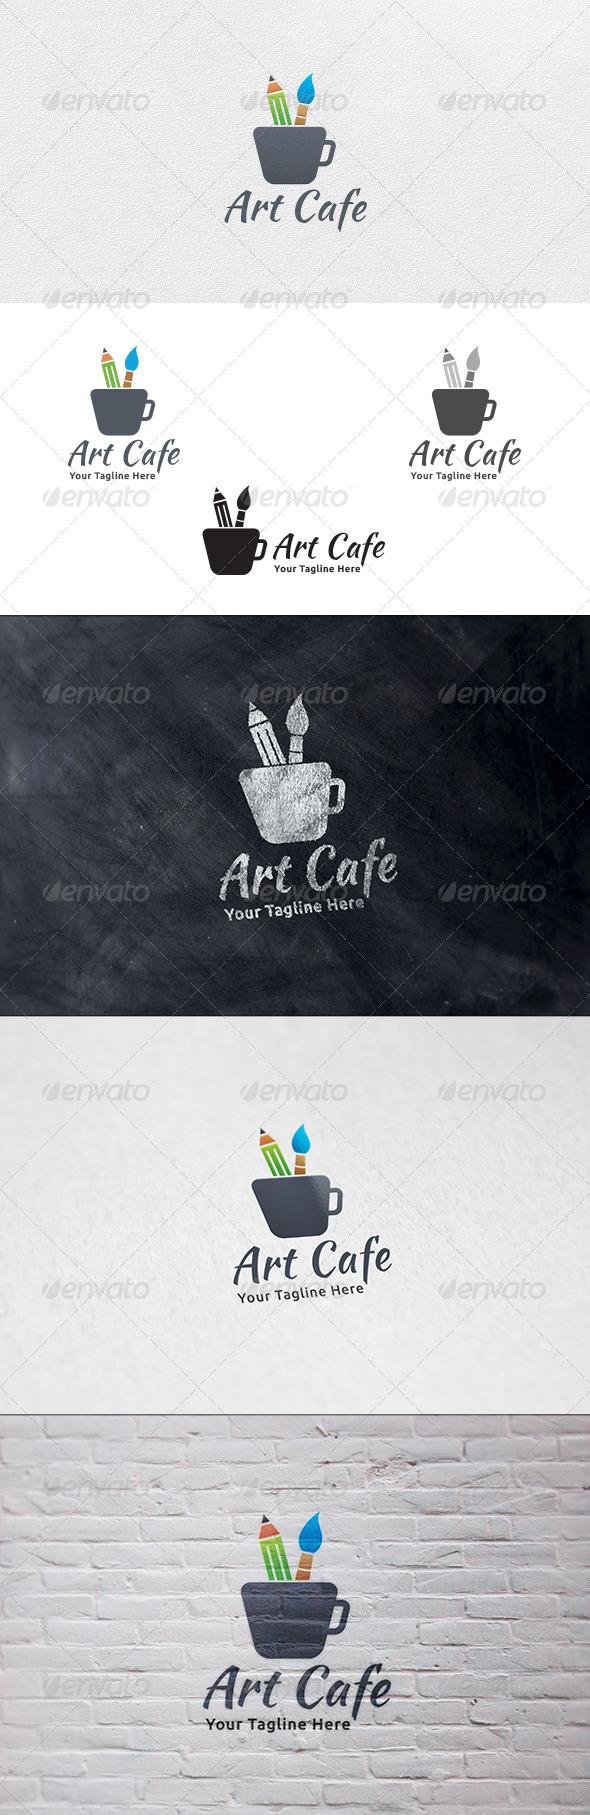 Art Cafe - Logo Template - Symbols Logo Templates